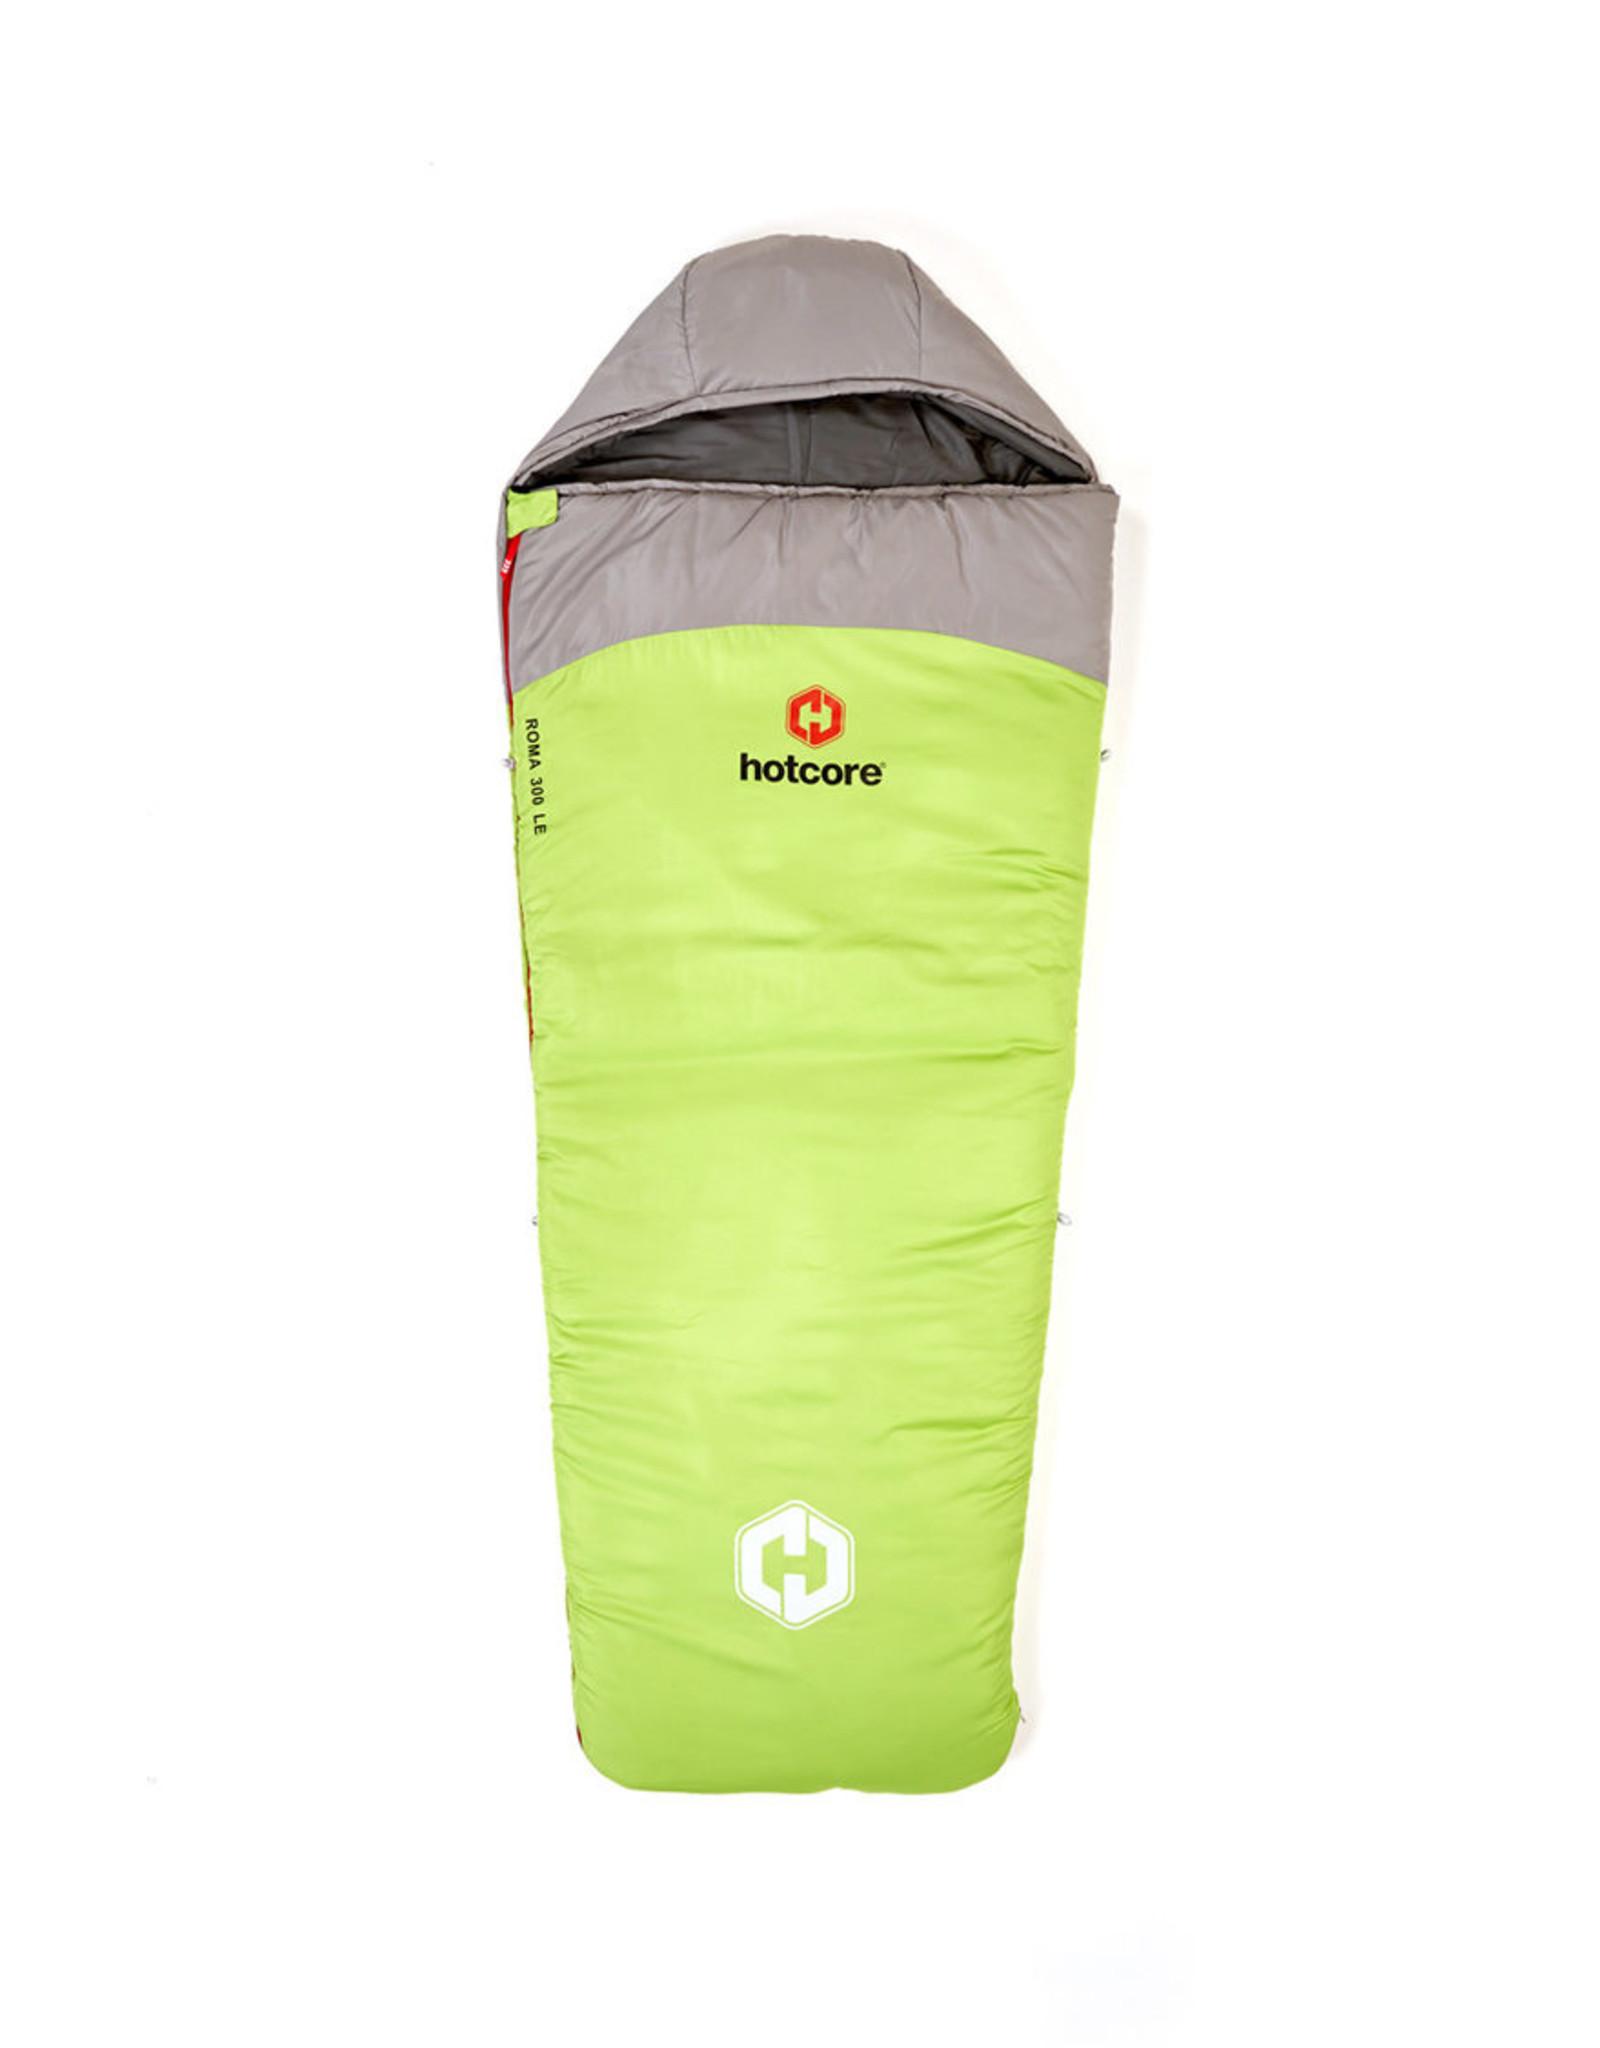 HOTCORE ROMA 300 SLEEPING BAG